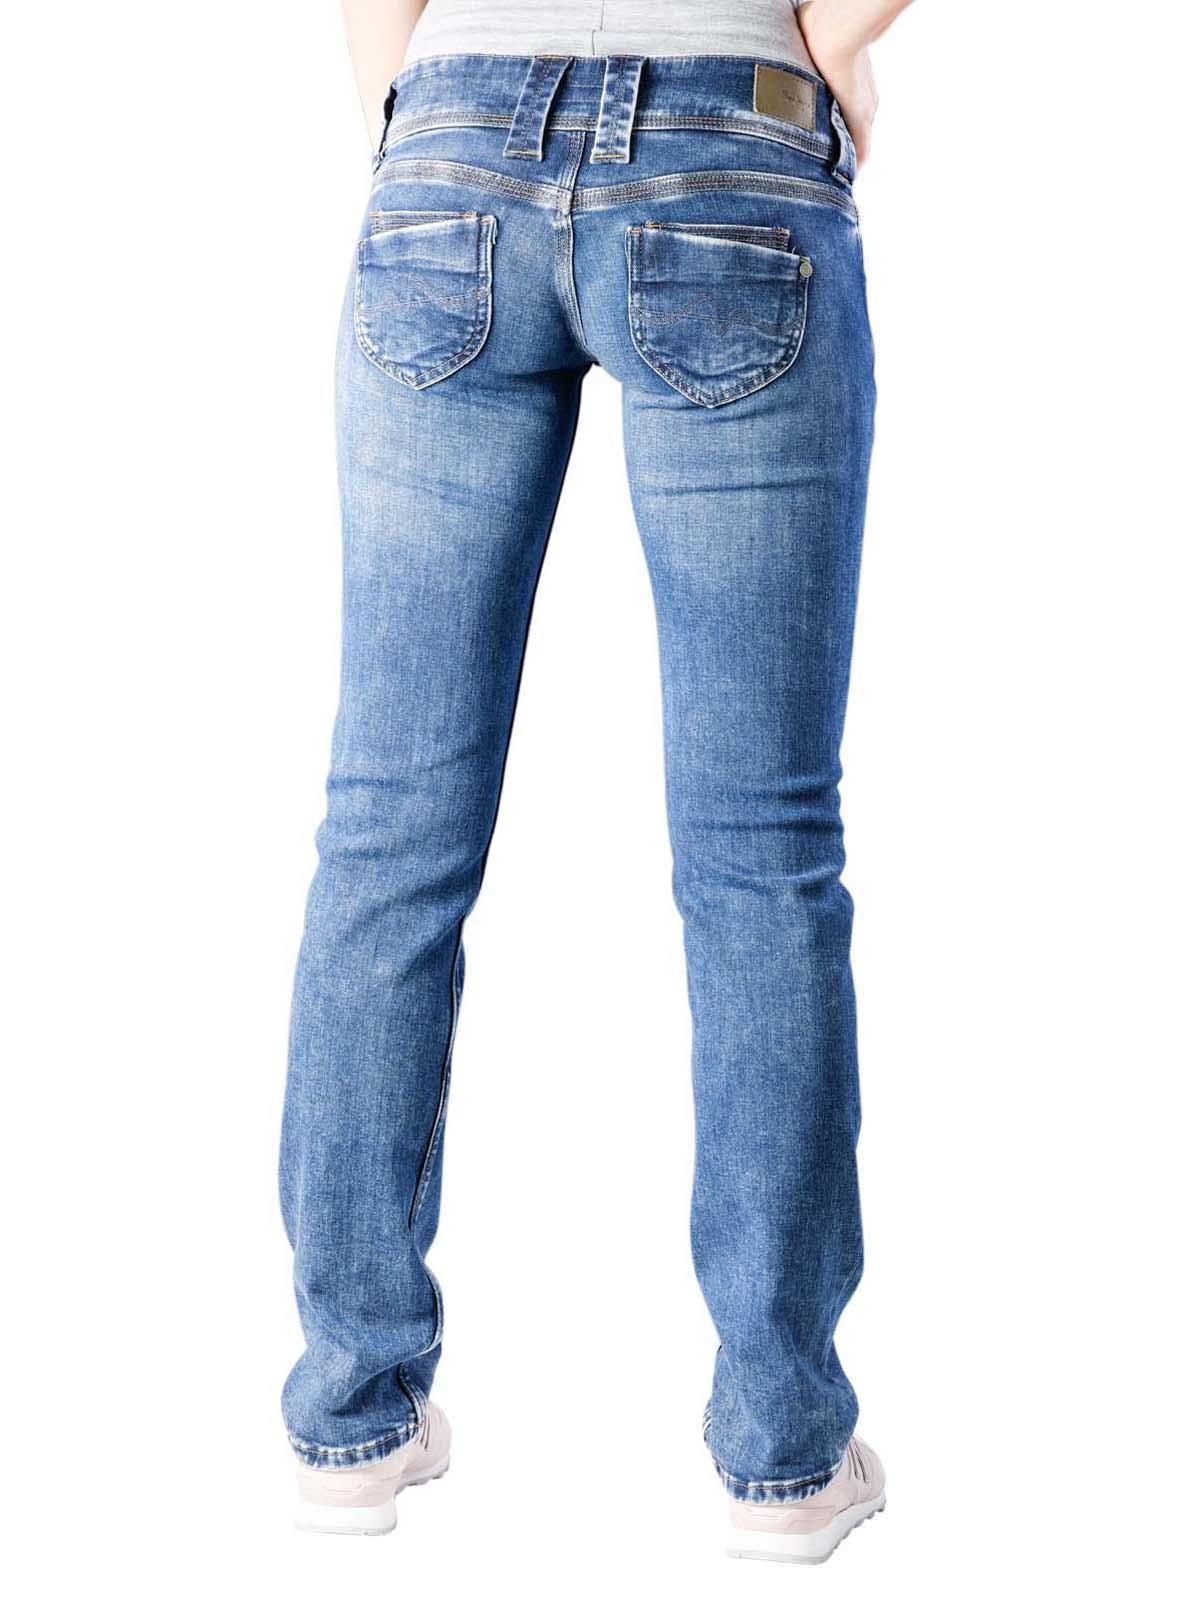 Pepe Jeans Venus Straight WT3 Pepe Jeans Women's Jeans